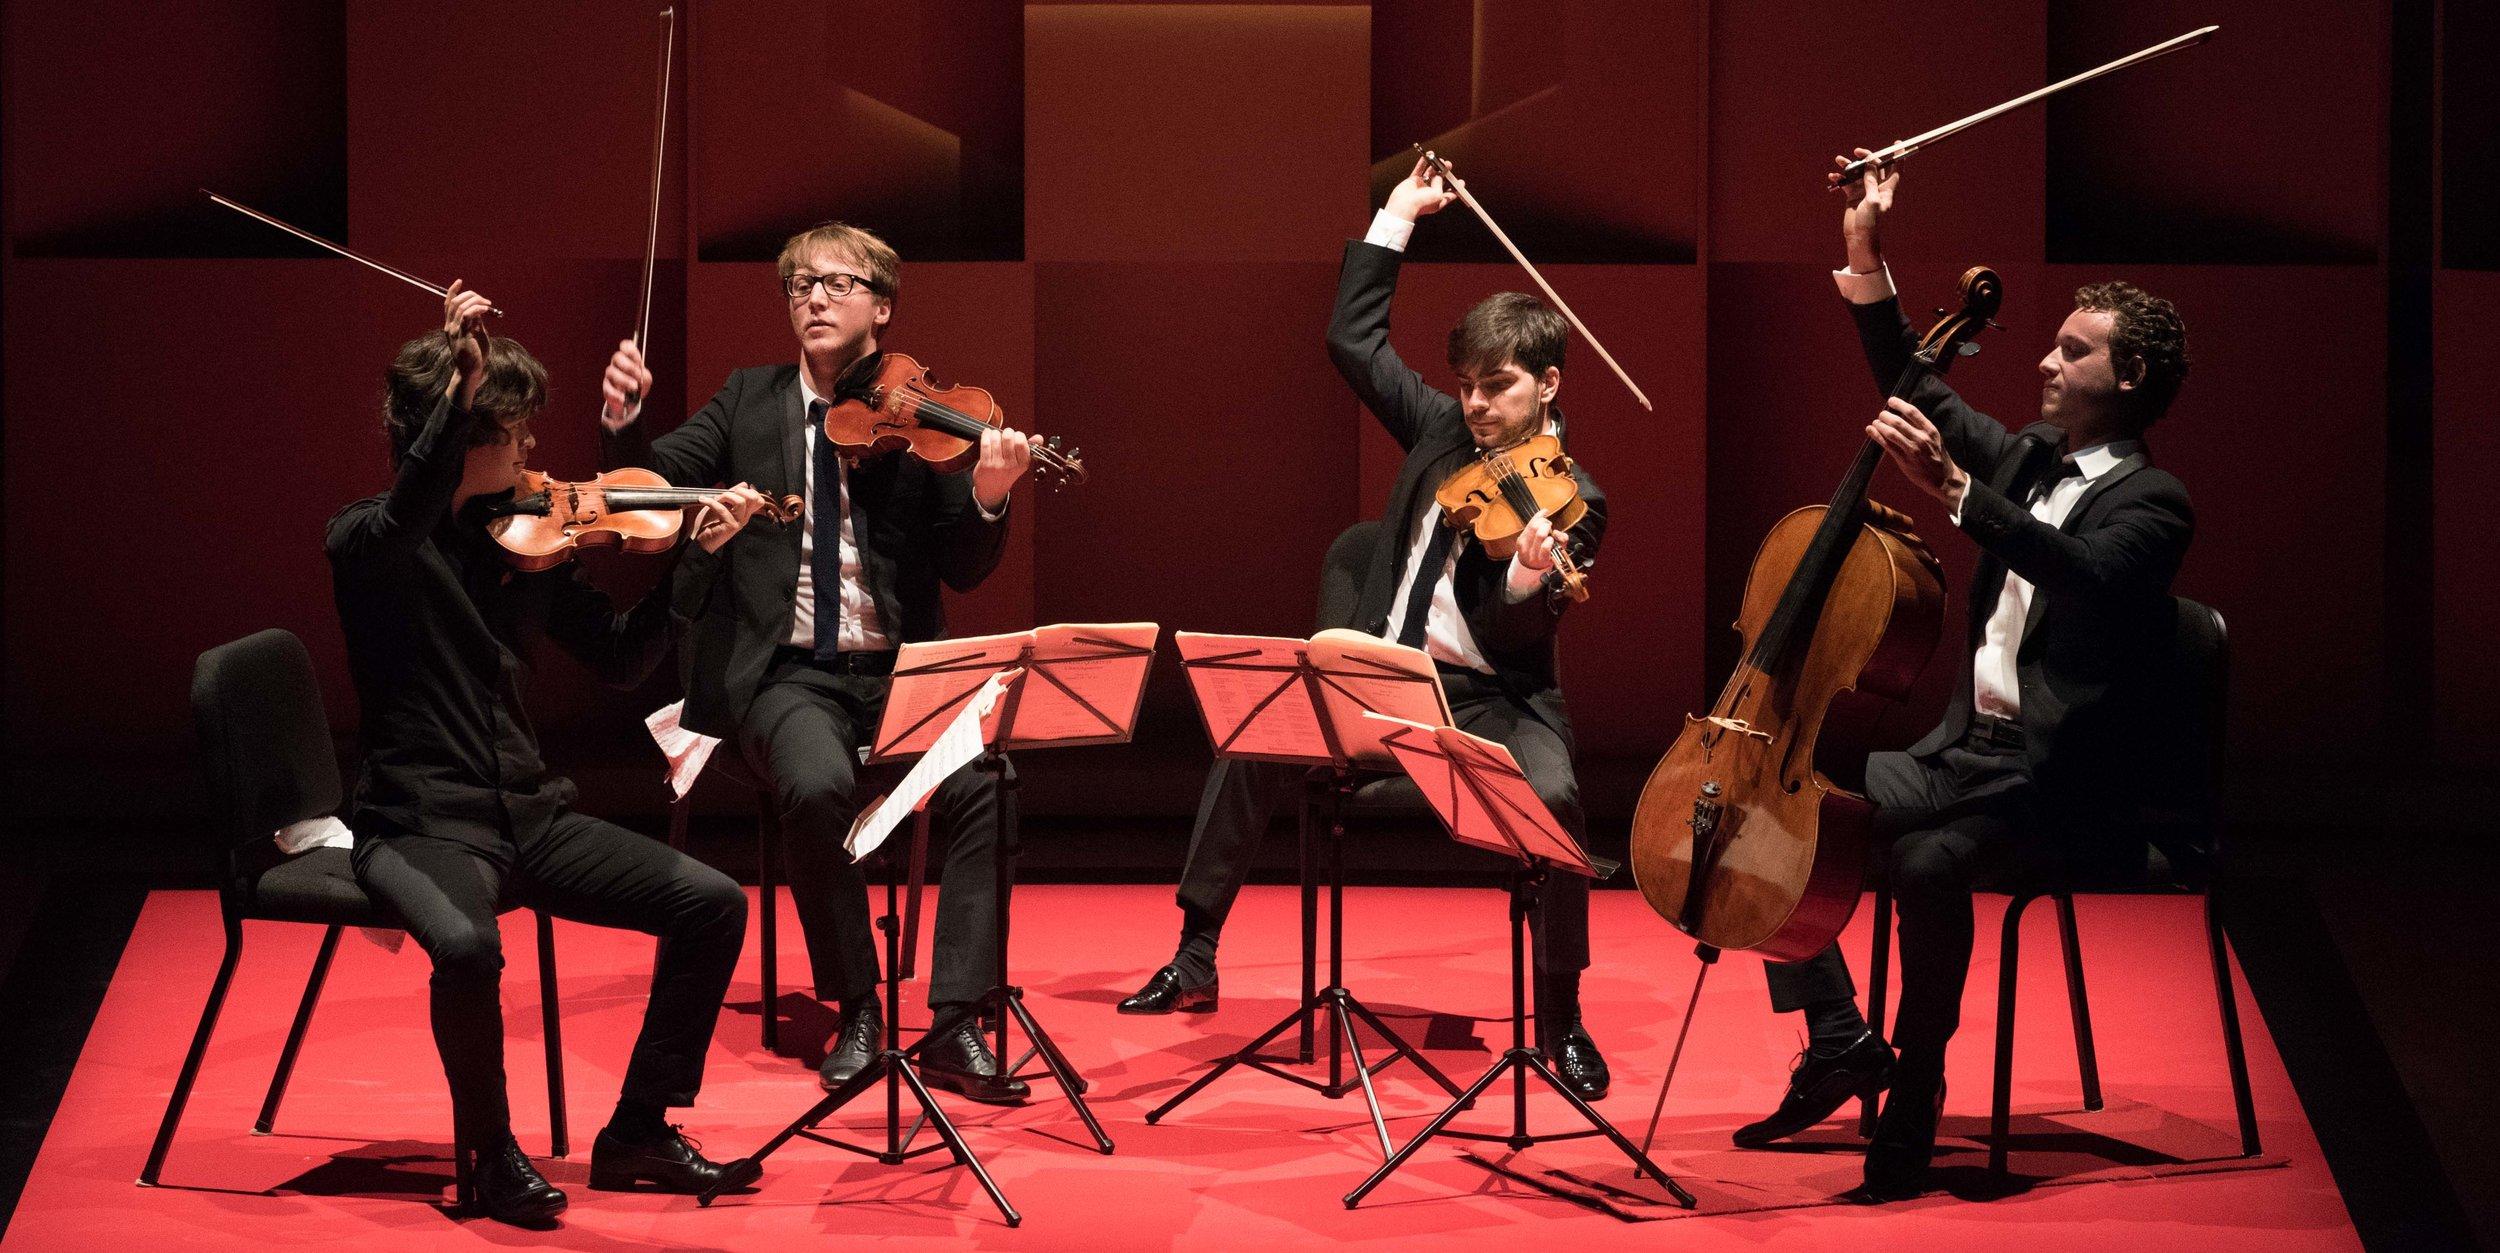 quatuorvankuijk2-radrienv.jpg